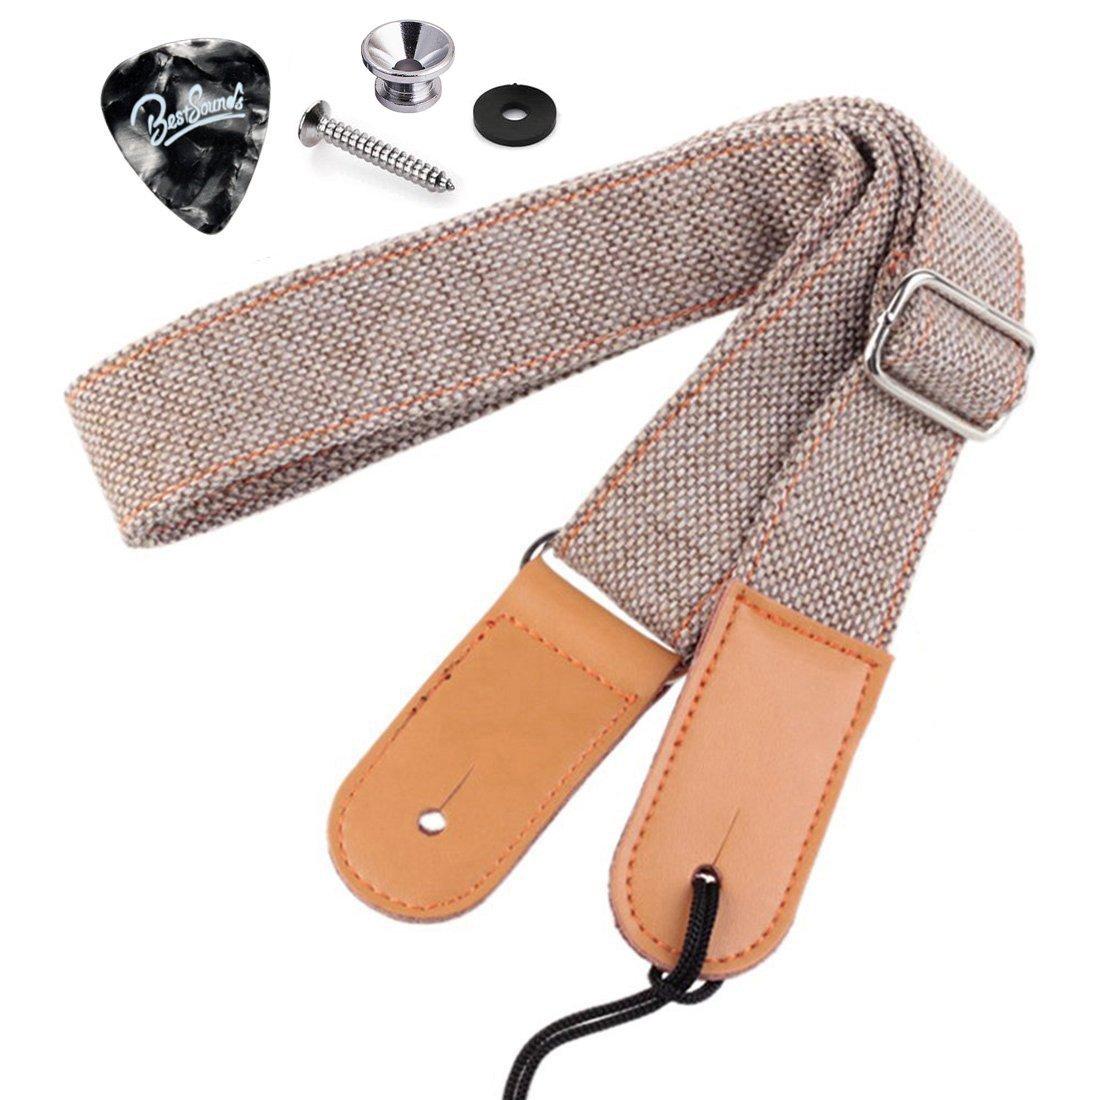 Rinastore Ukulele Strap Country Style Soft Cotton Linen & Genuine Leather Ukulele Shoulder Strap (Lt Grey-US-12)